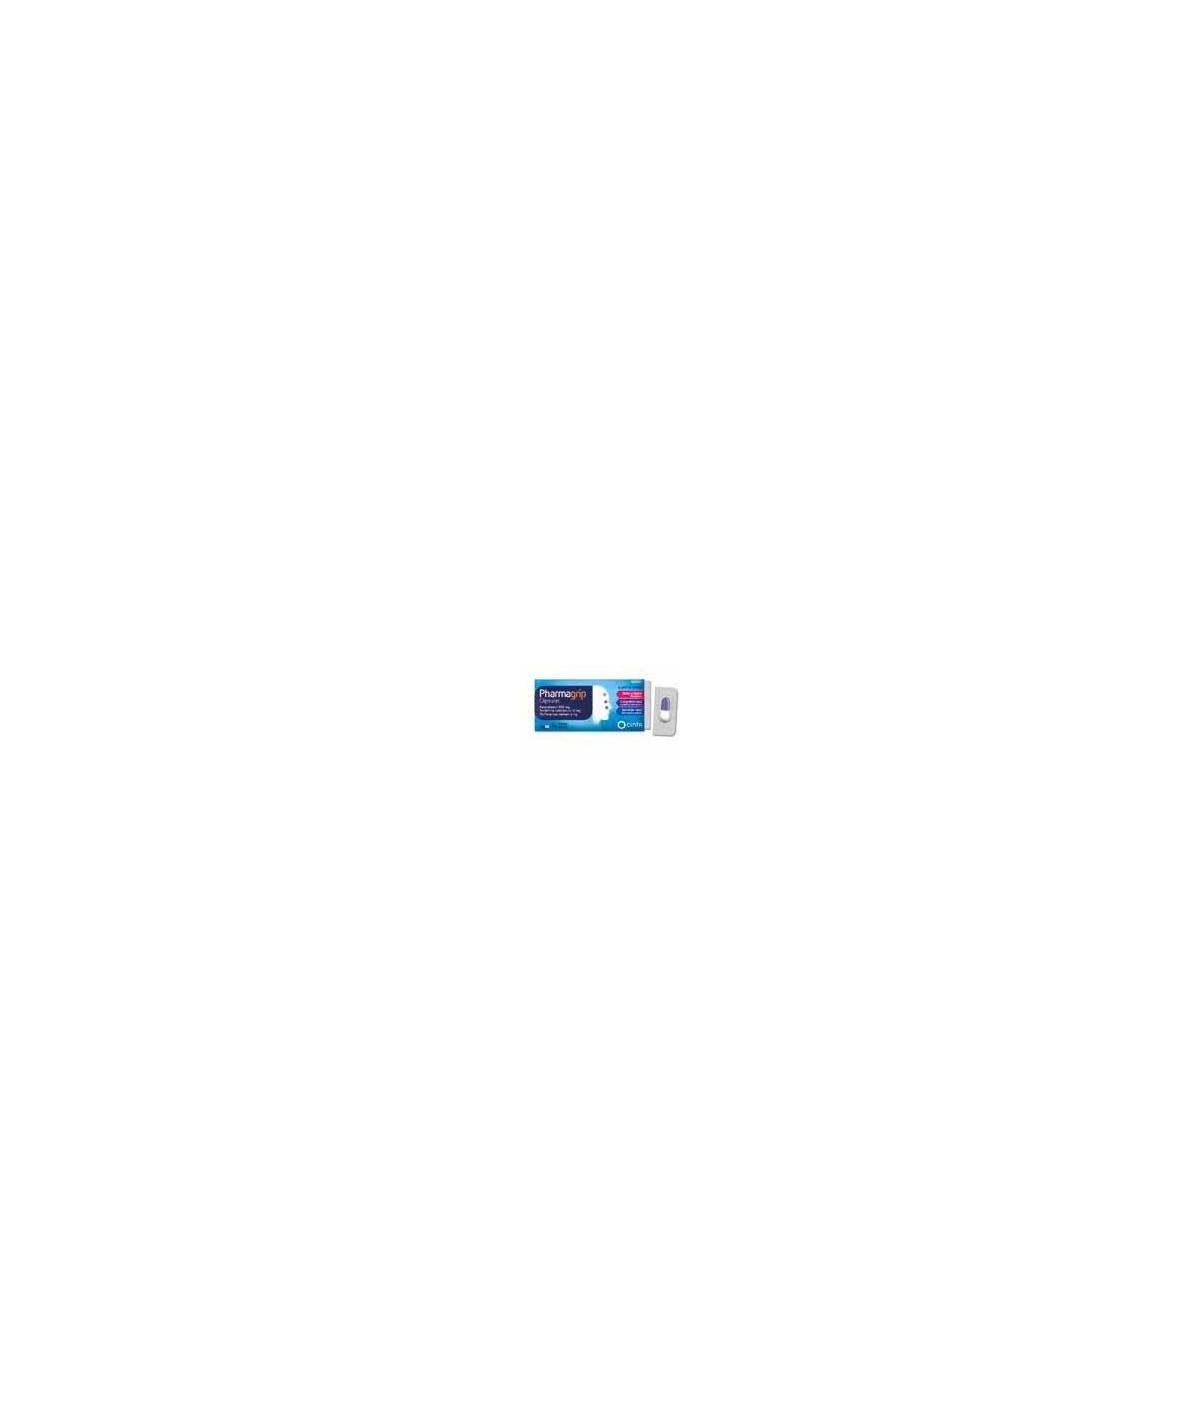 PACK OSMOCLEAN DESINCRUSTANTE 75 ML + CLARIFICANTE 75 ML + REGALO MANOPLAS - Esthederm